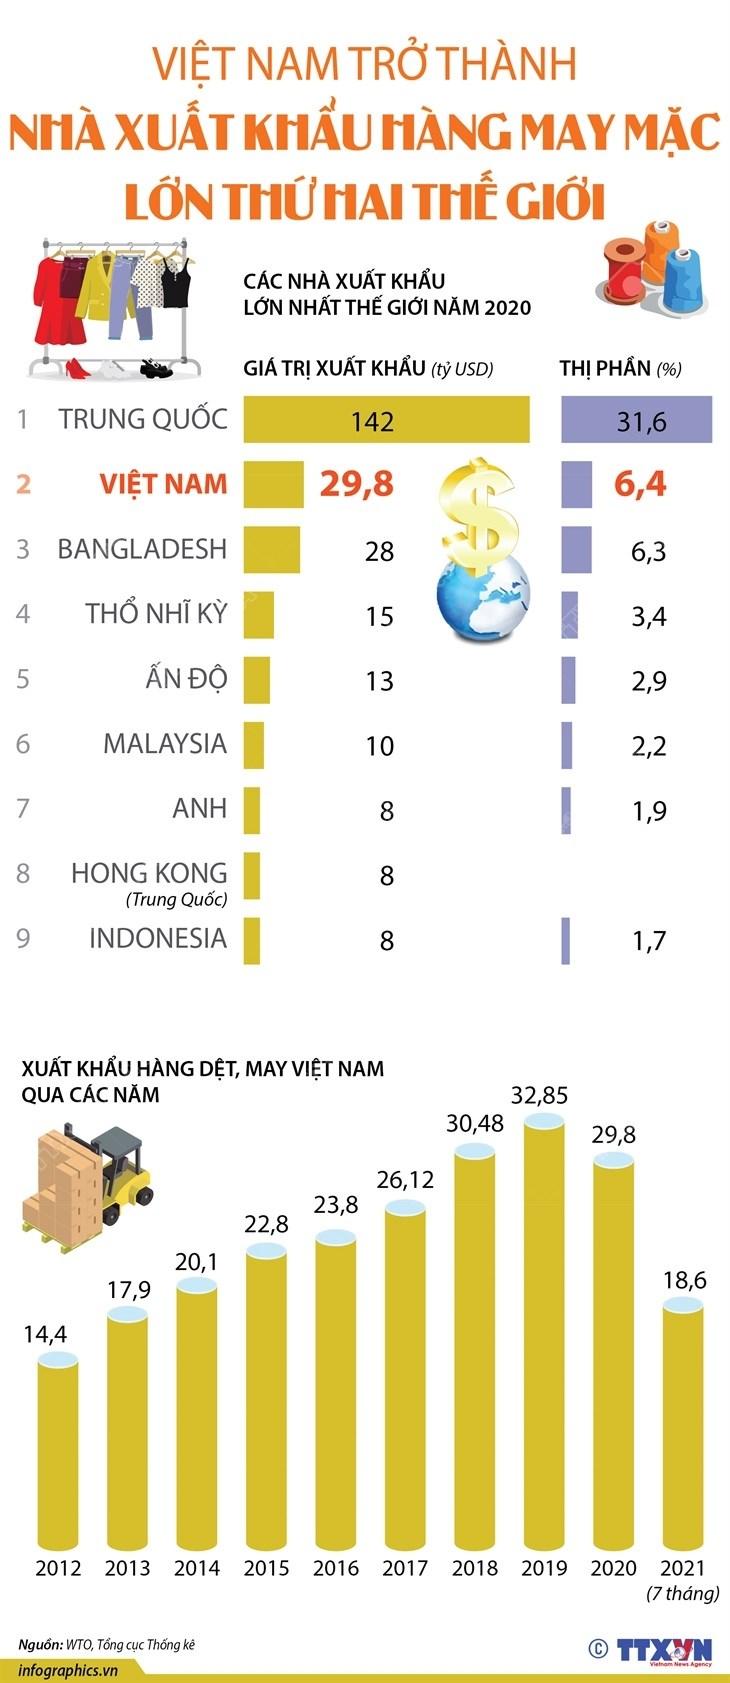 [Infographics] Viet Nam xuat khau hang may mac lon thu 2 the gioi hinh anh 1